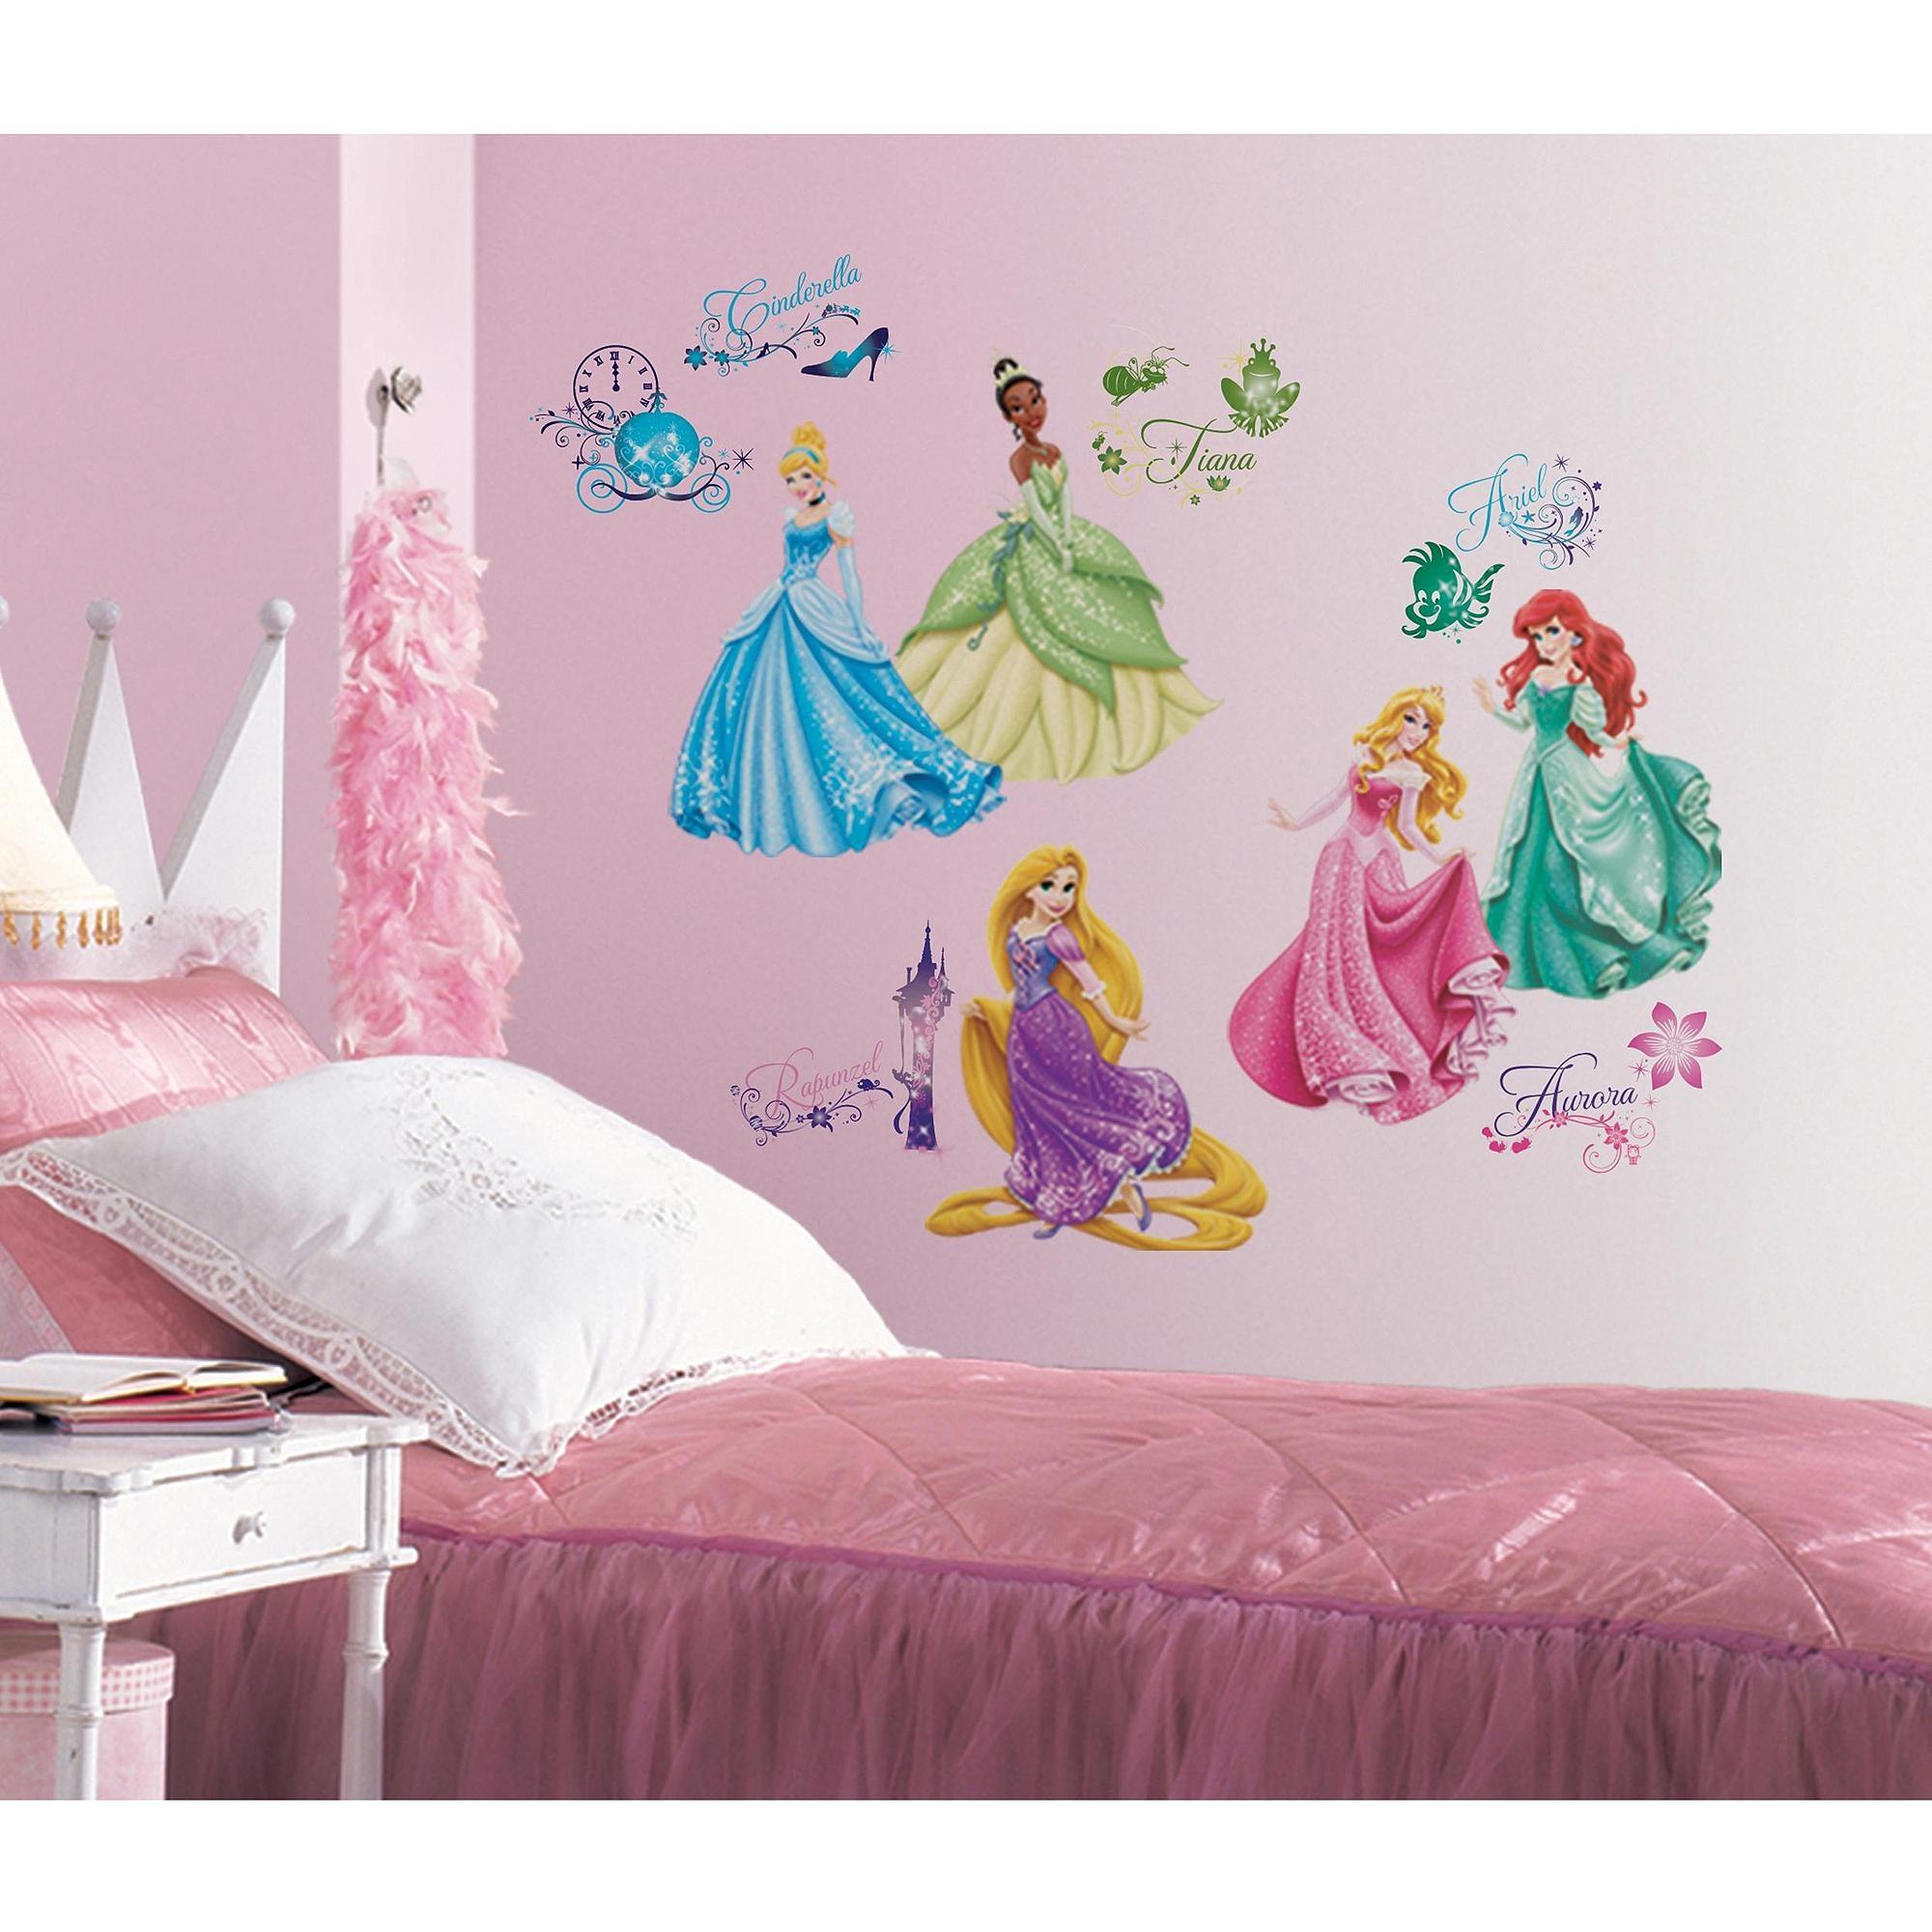 Disney Princess Royal Debut Peel And Stick Wall Decals – Walmart With Disney Princess Wall Art (View 4 of 20)